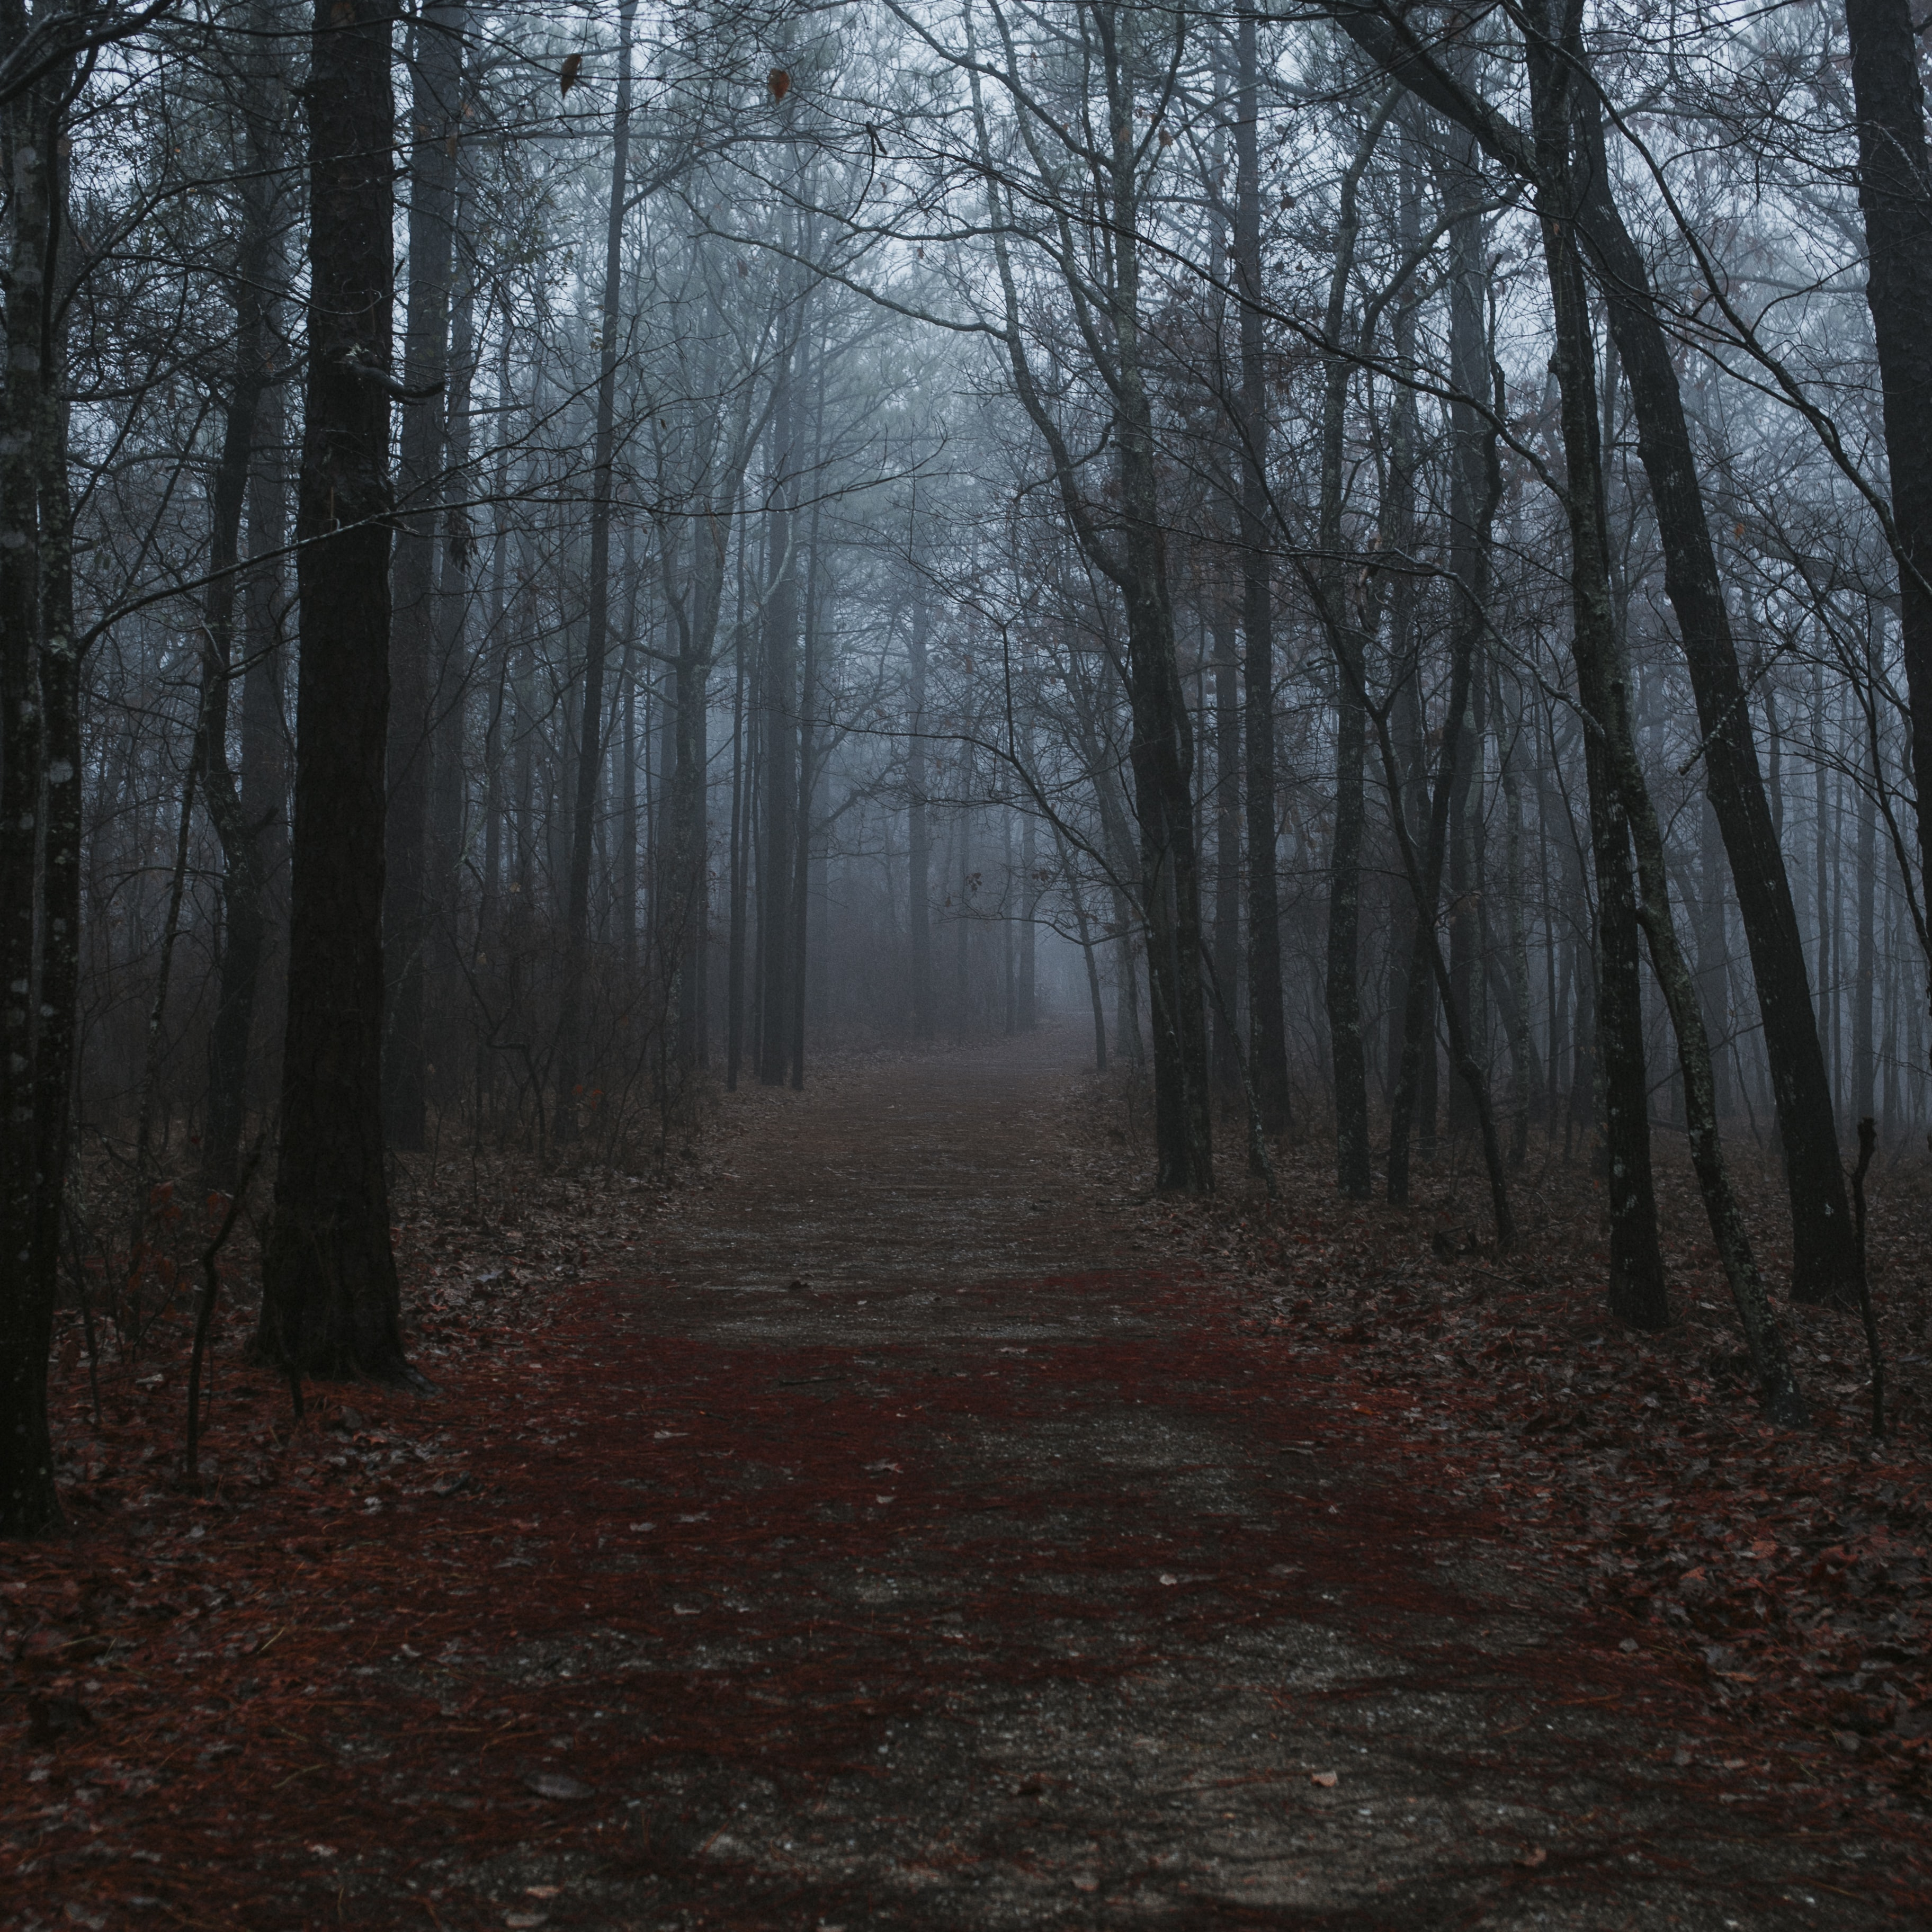 A dark forest walking path.